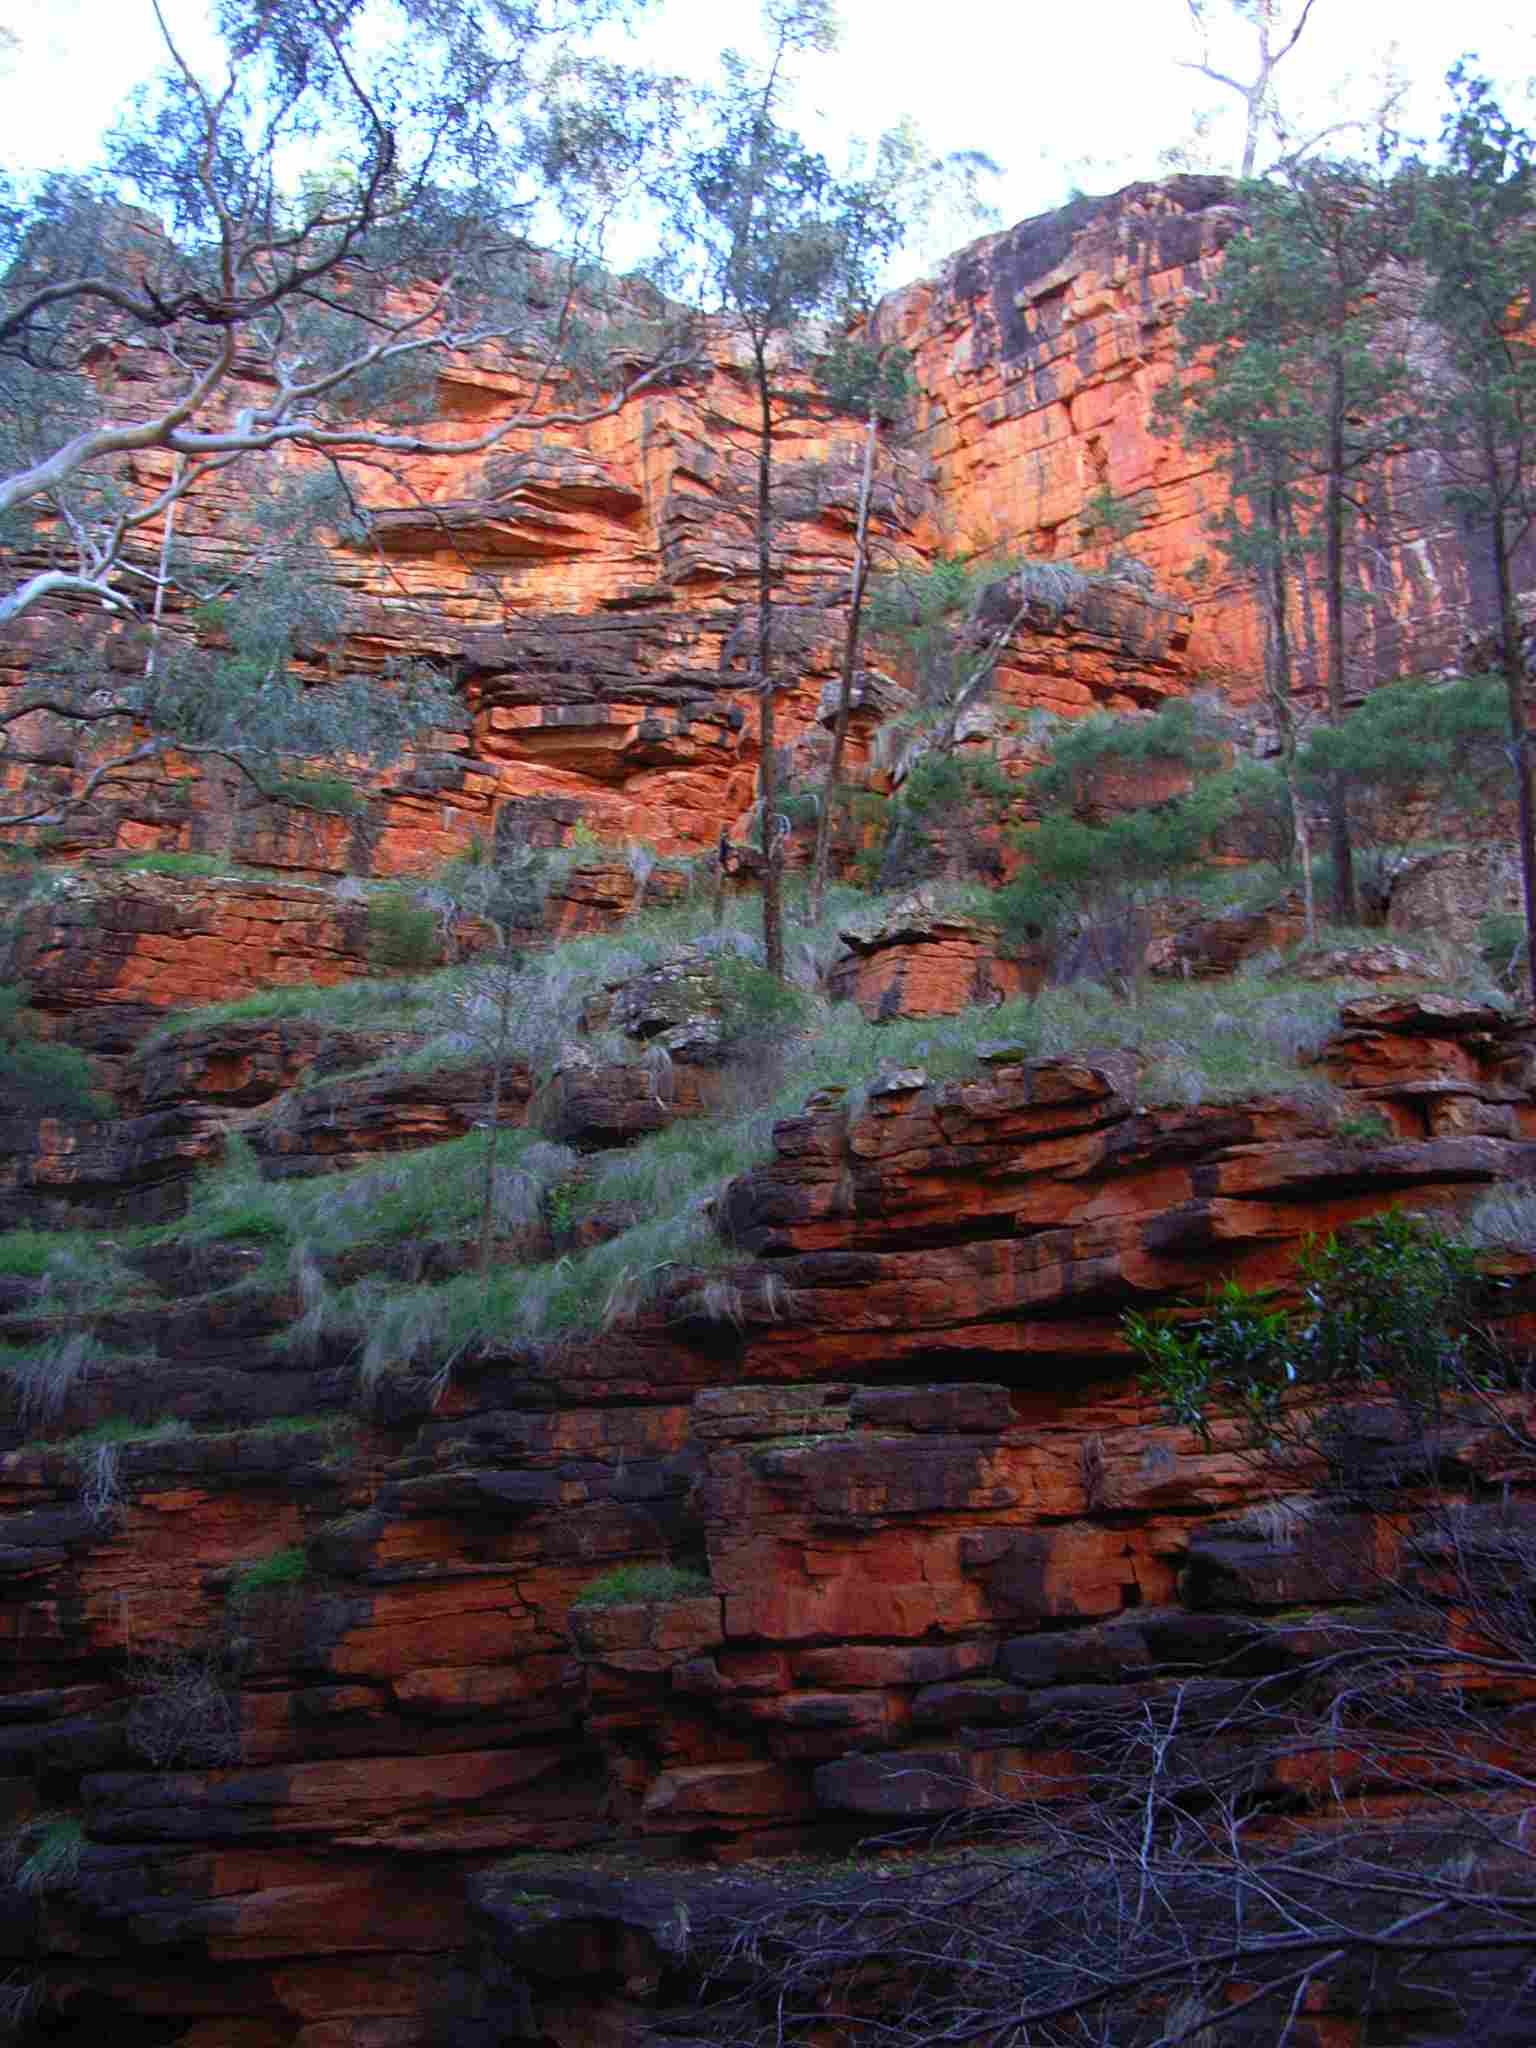 Iron Oxide Outcrop, Alligator Gorge, Flinders Range, South Australia